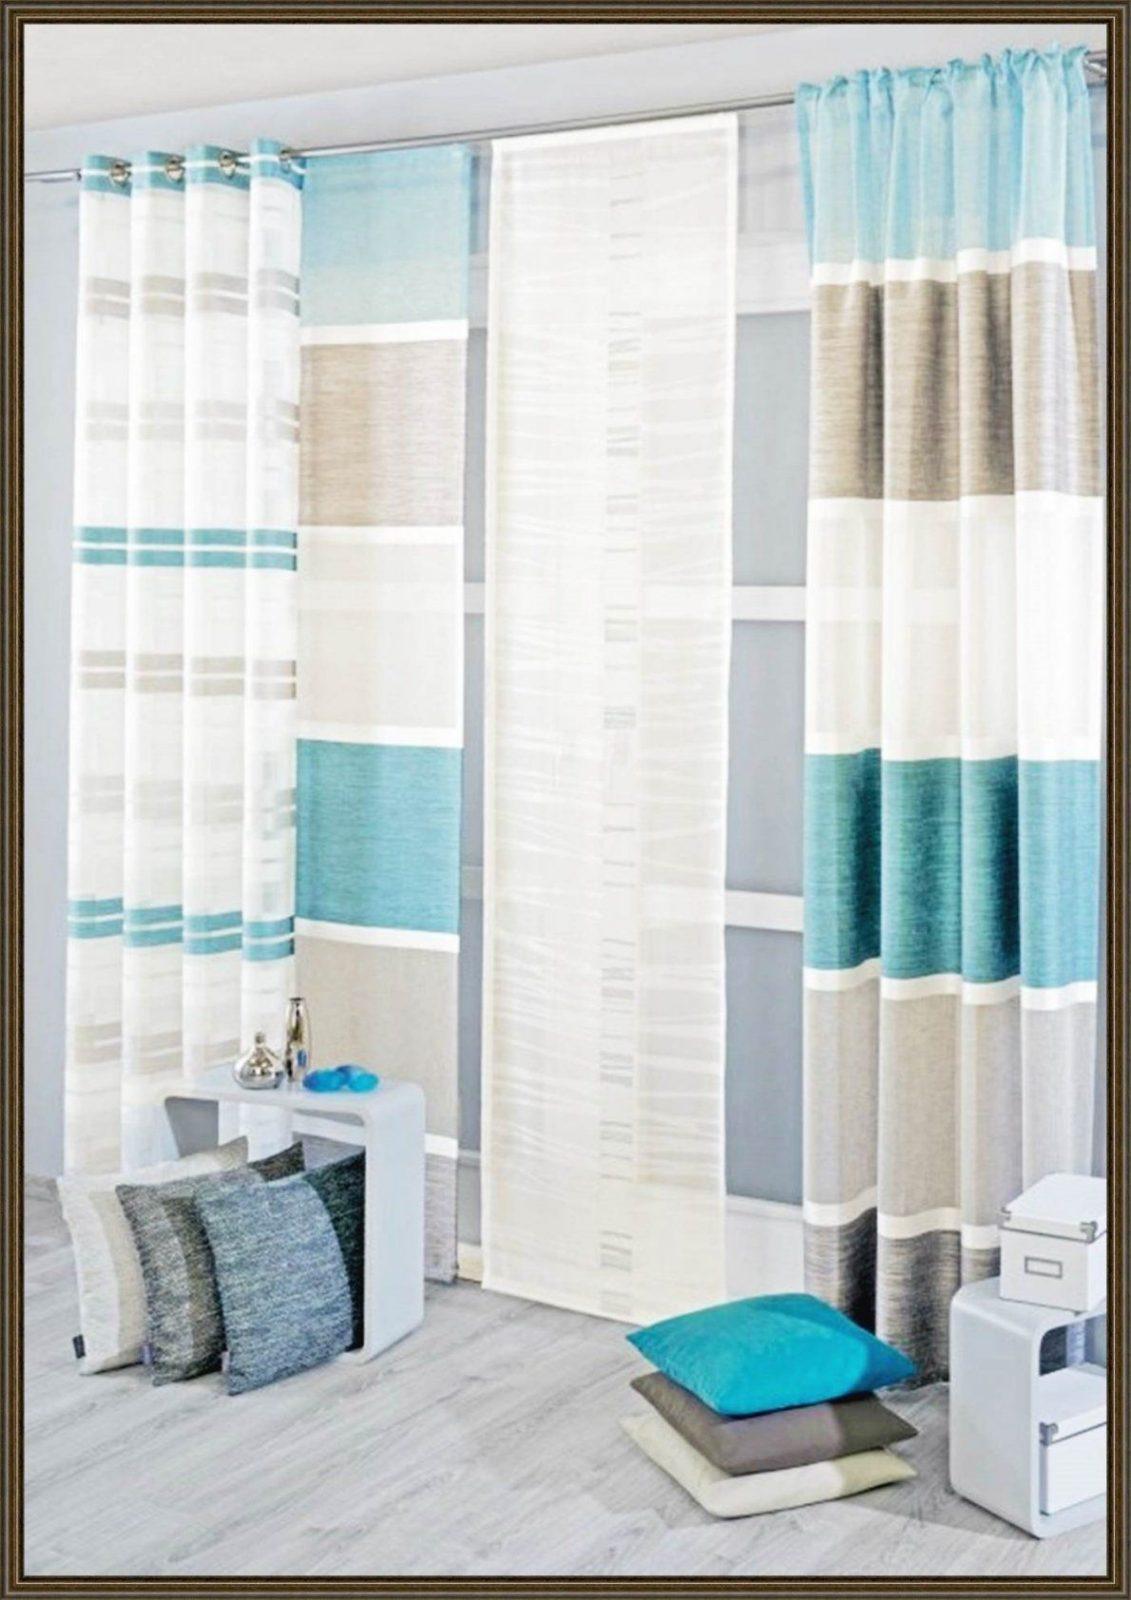 30 ideen f r fr hlingsdeko im shabby chic look von shabby chic deko ideen bild haus design ideen. Black Bedroom Furniture Sets. Home Design Ideas